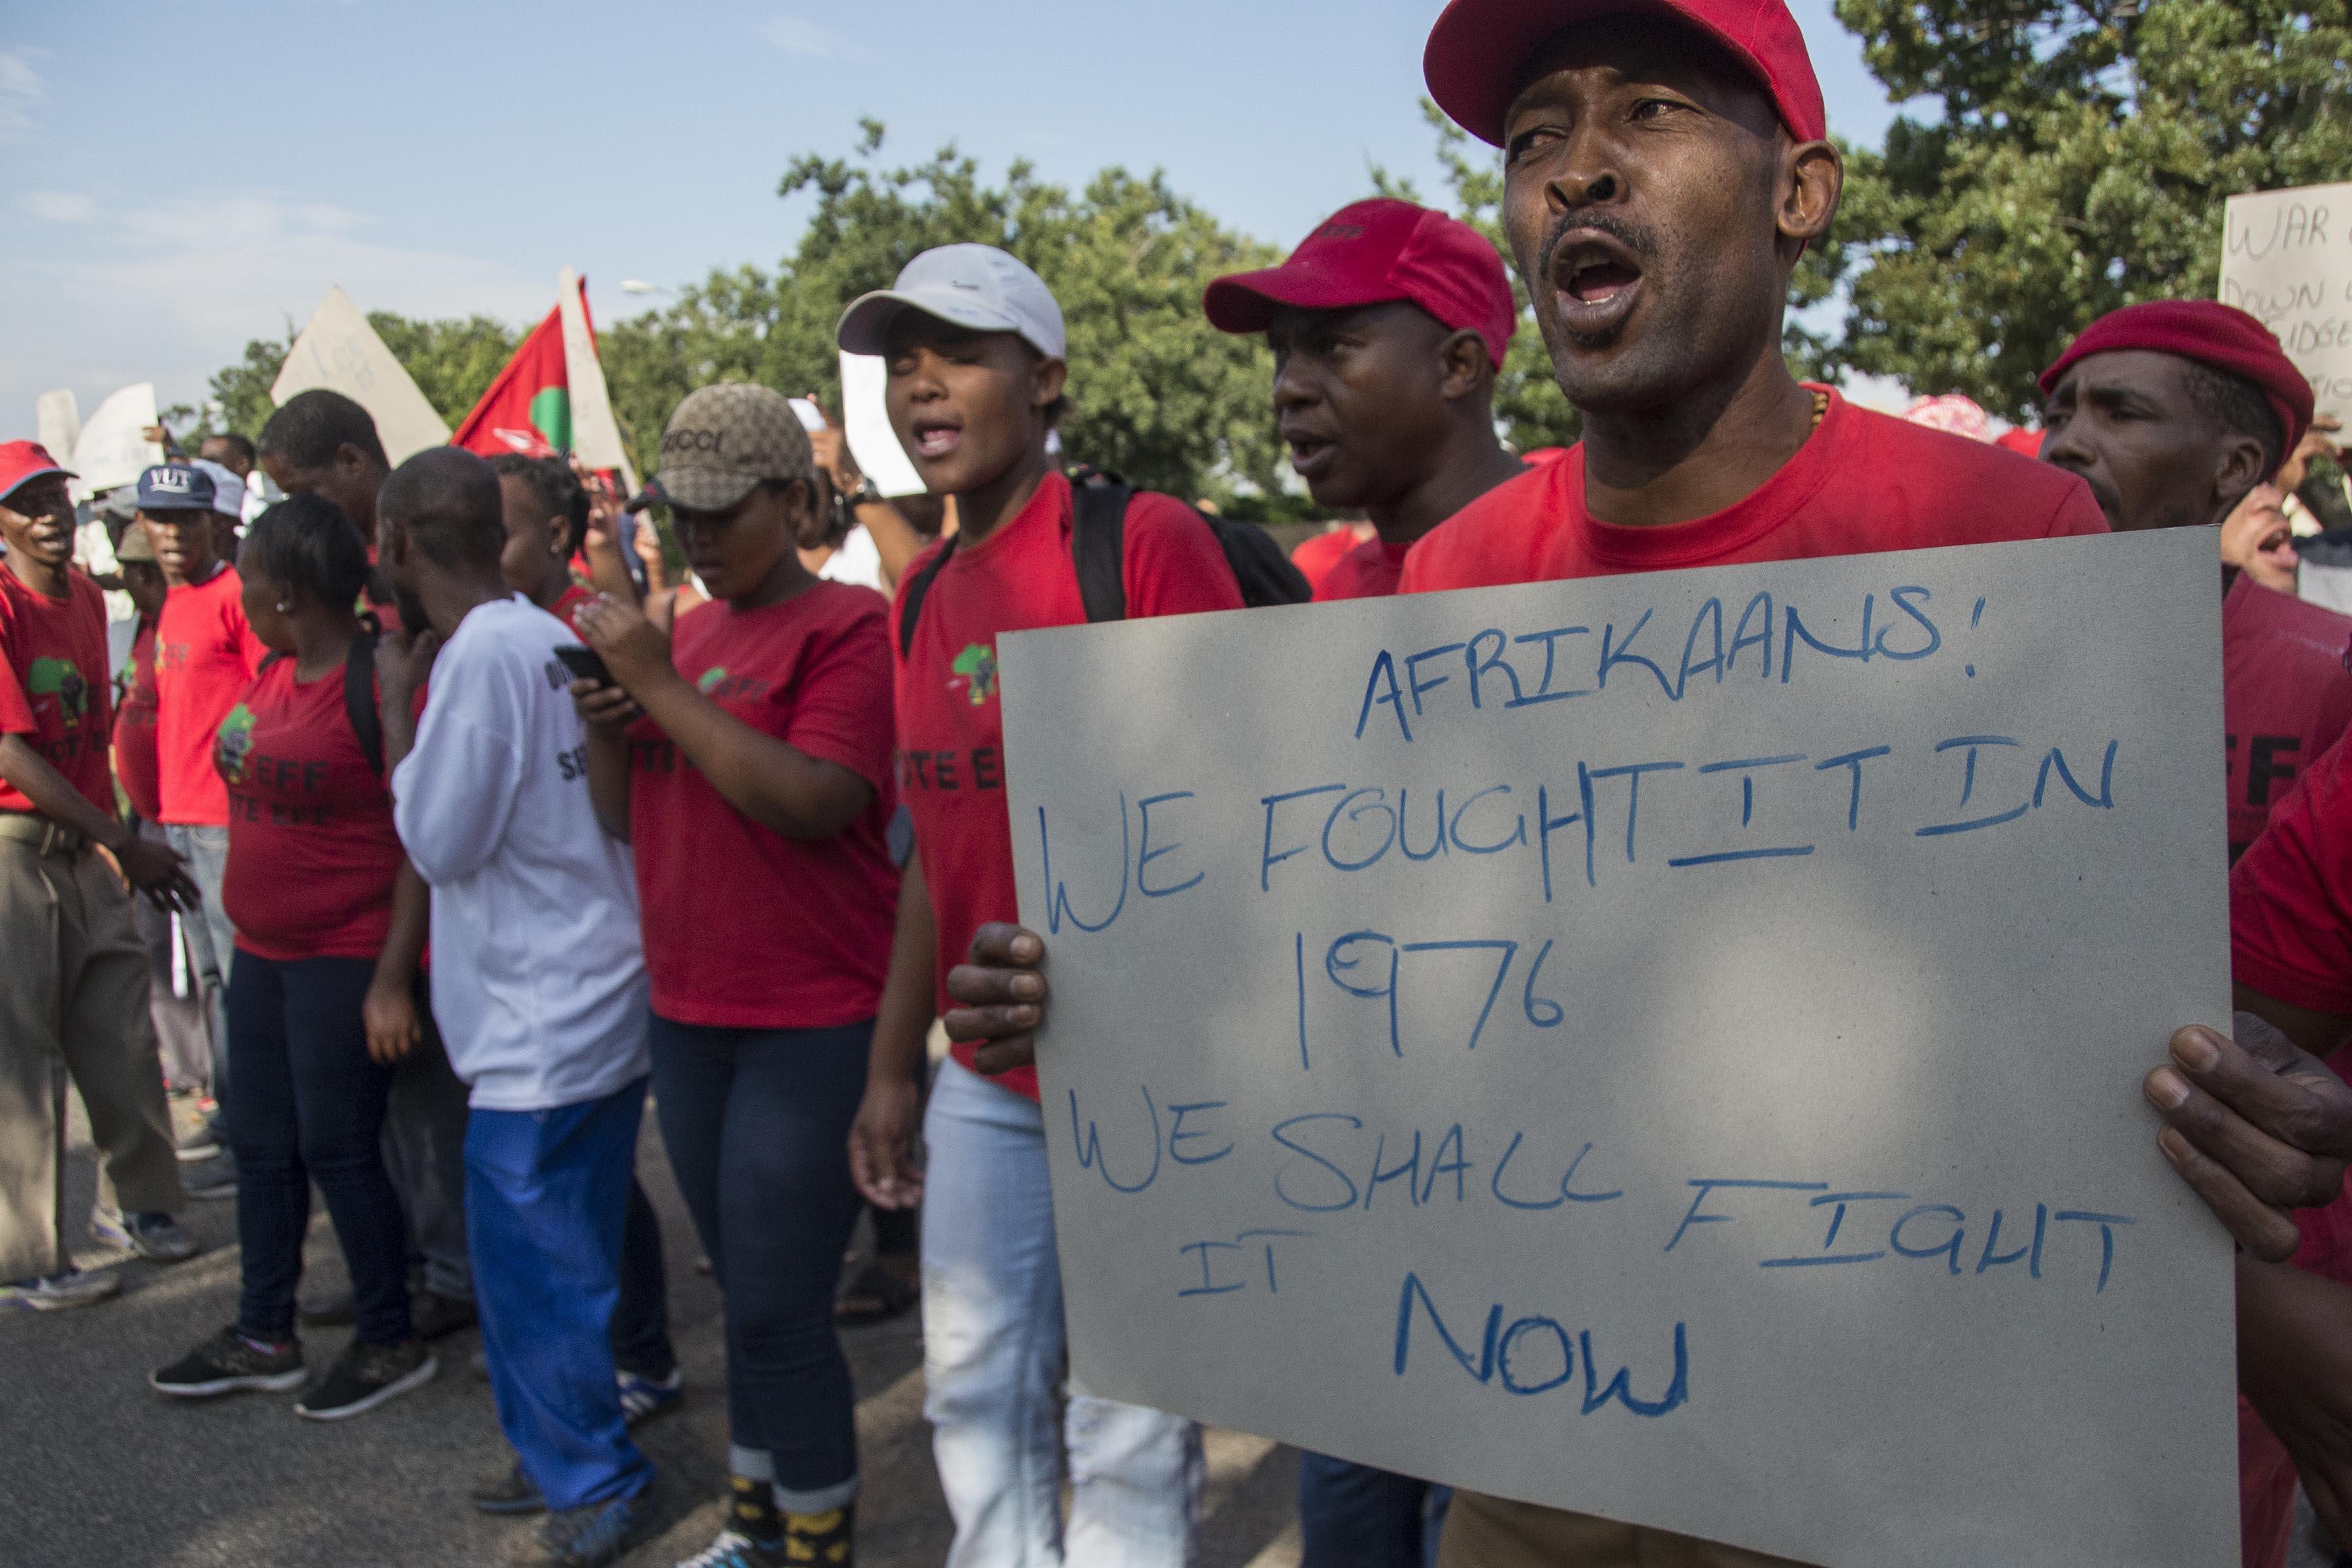 Hoërskool Overvaal: DA T-shirt burned as tensions escalate